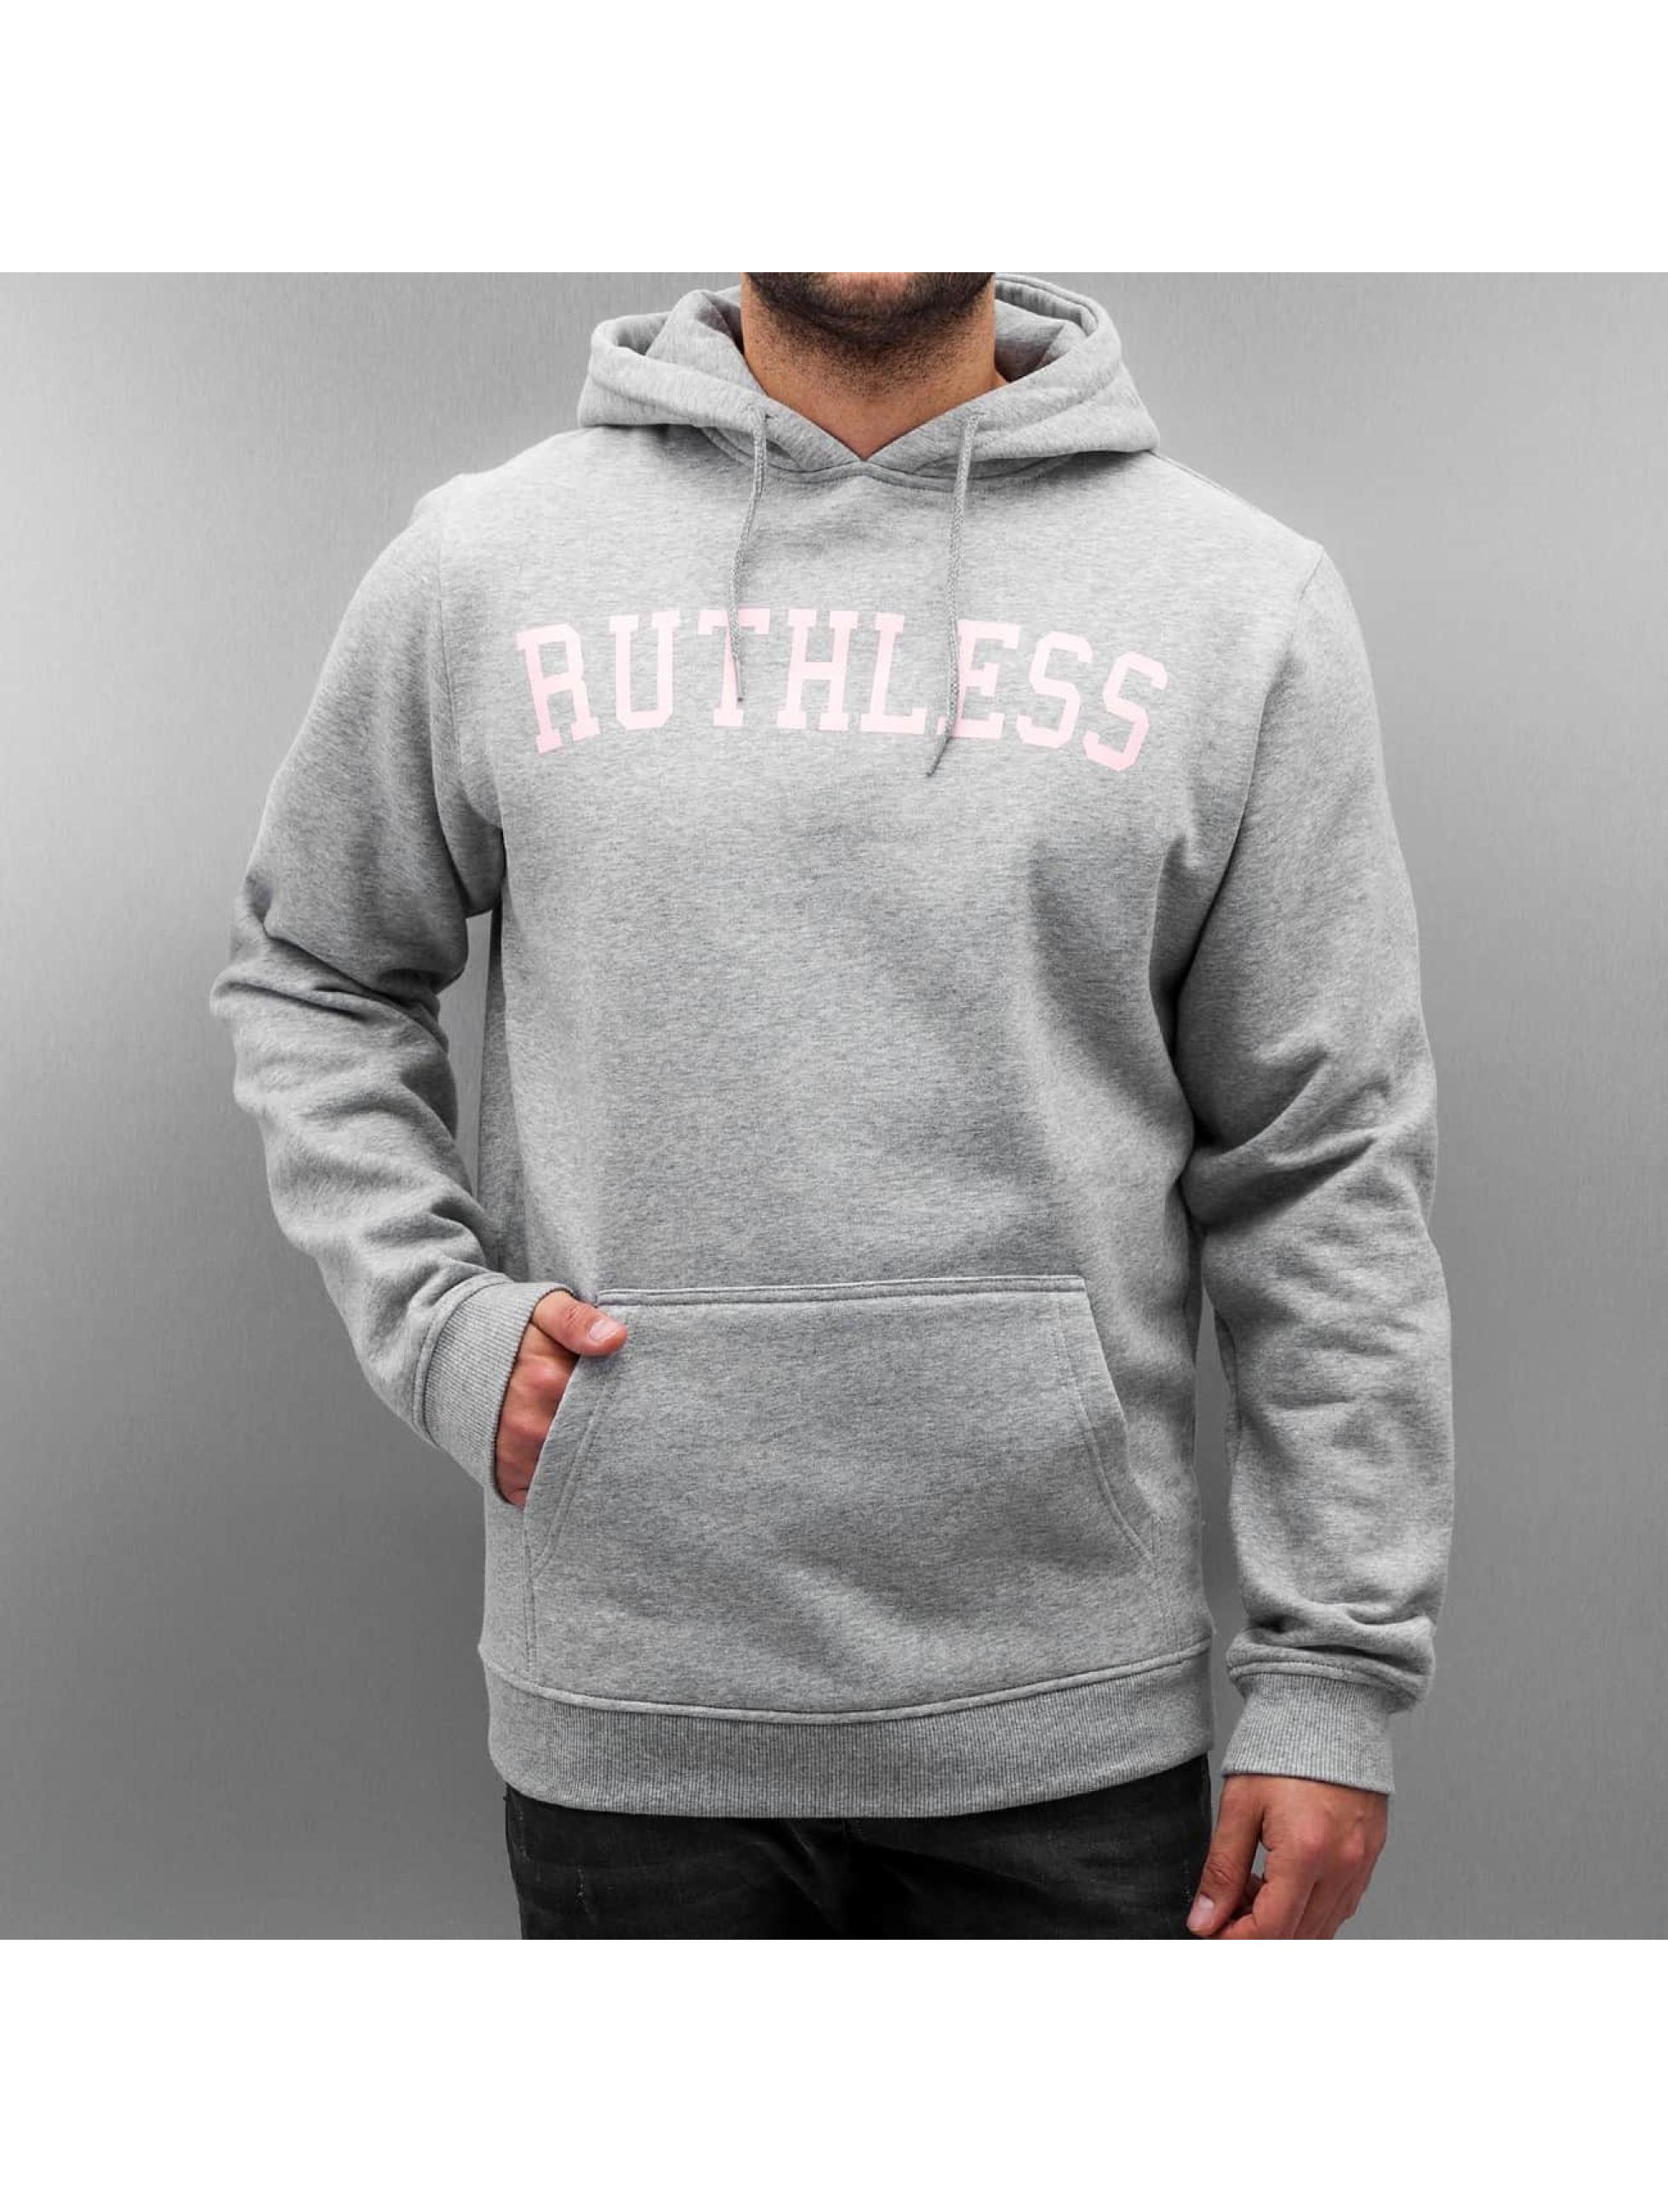 Mister Tee Hoodie Ruthless gray